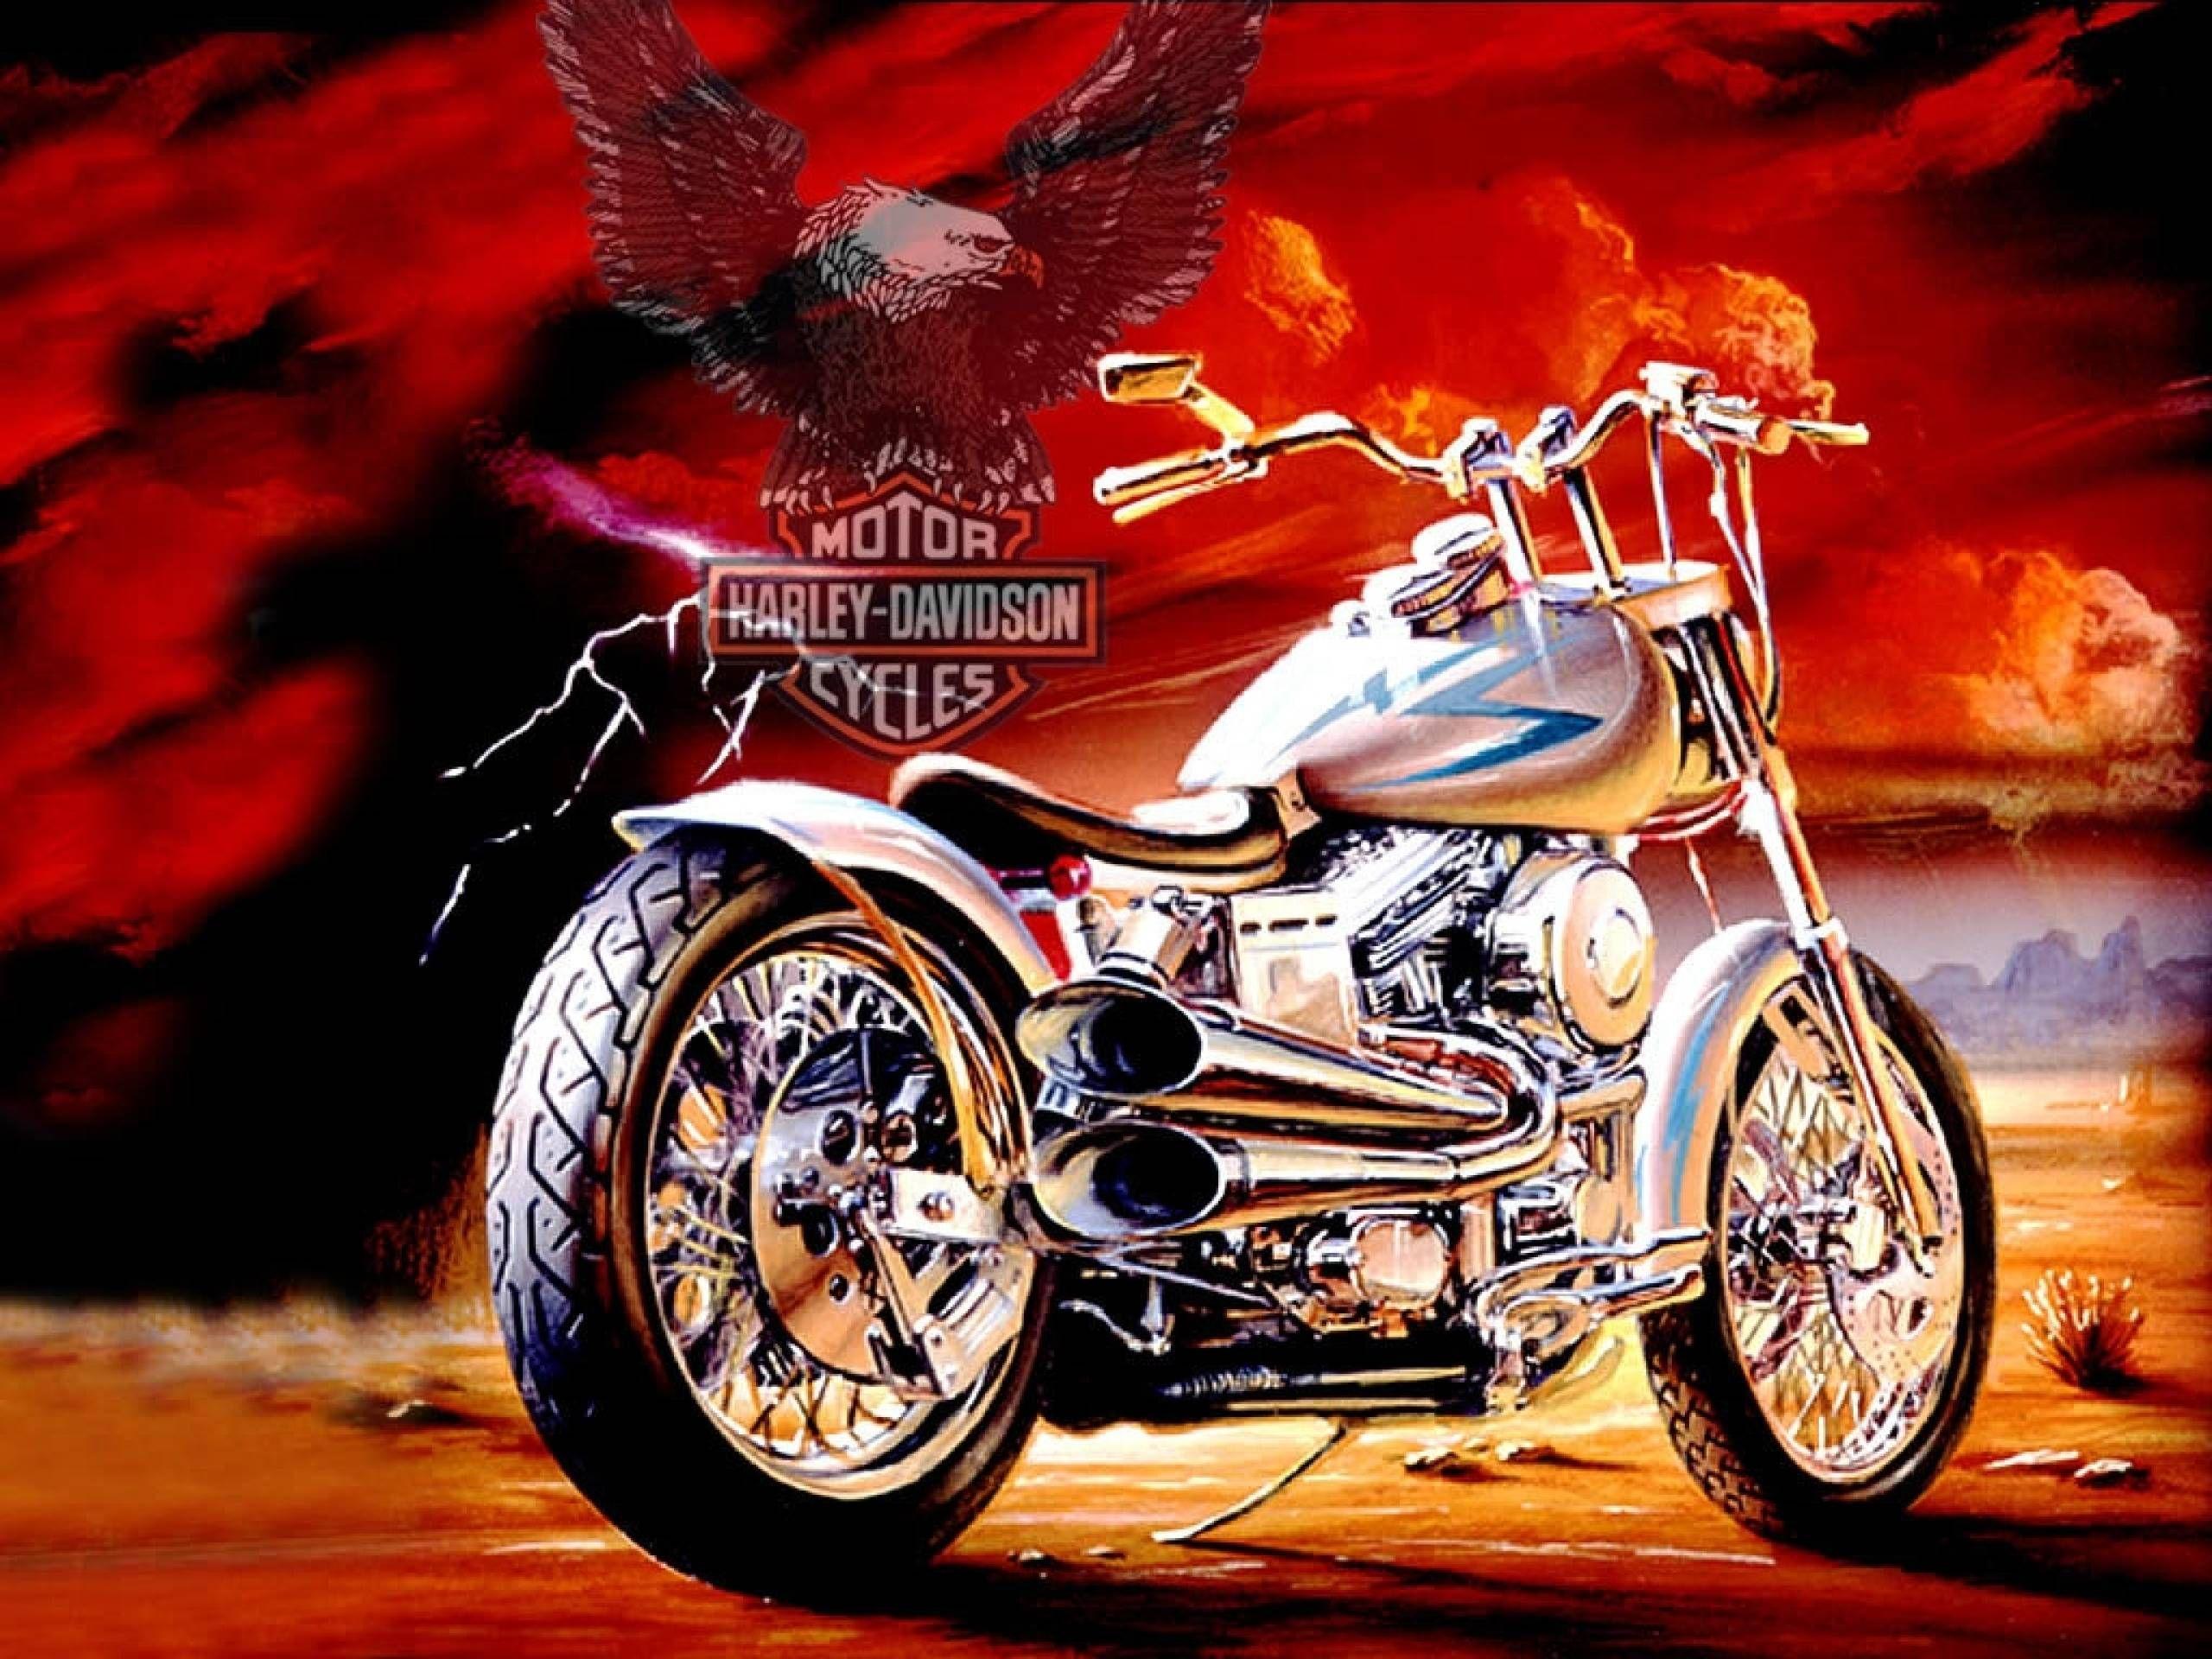 Harley Davidson Wallpapers Wallpaper in 2019 Motorcycle